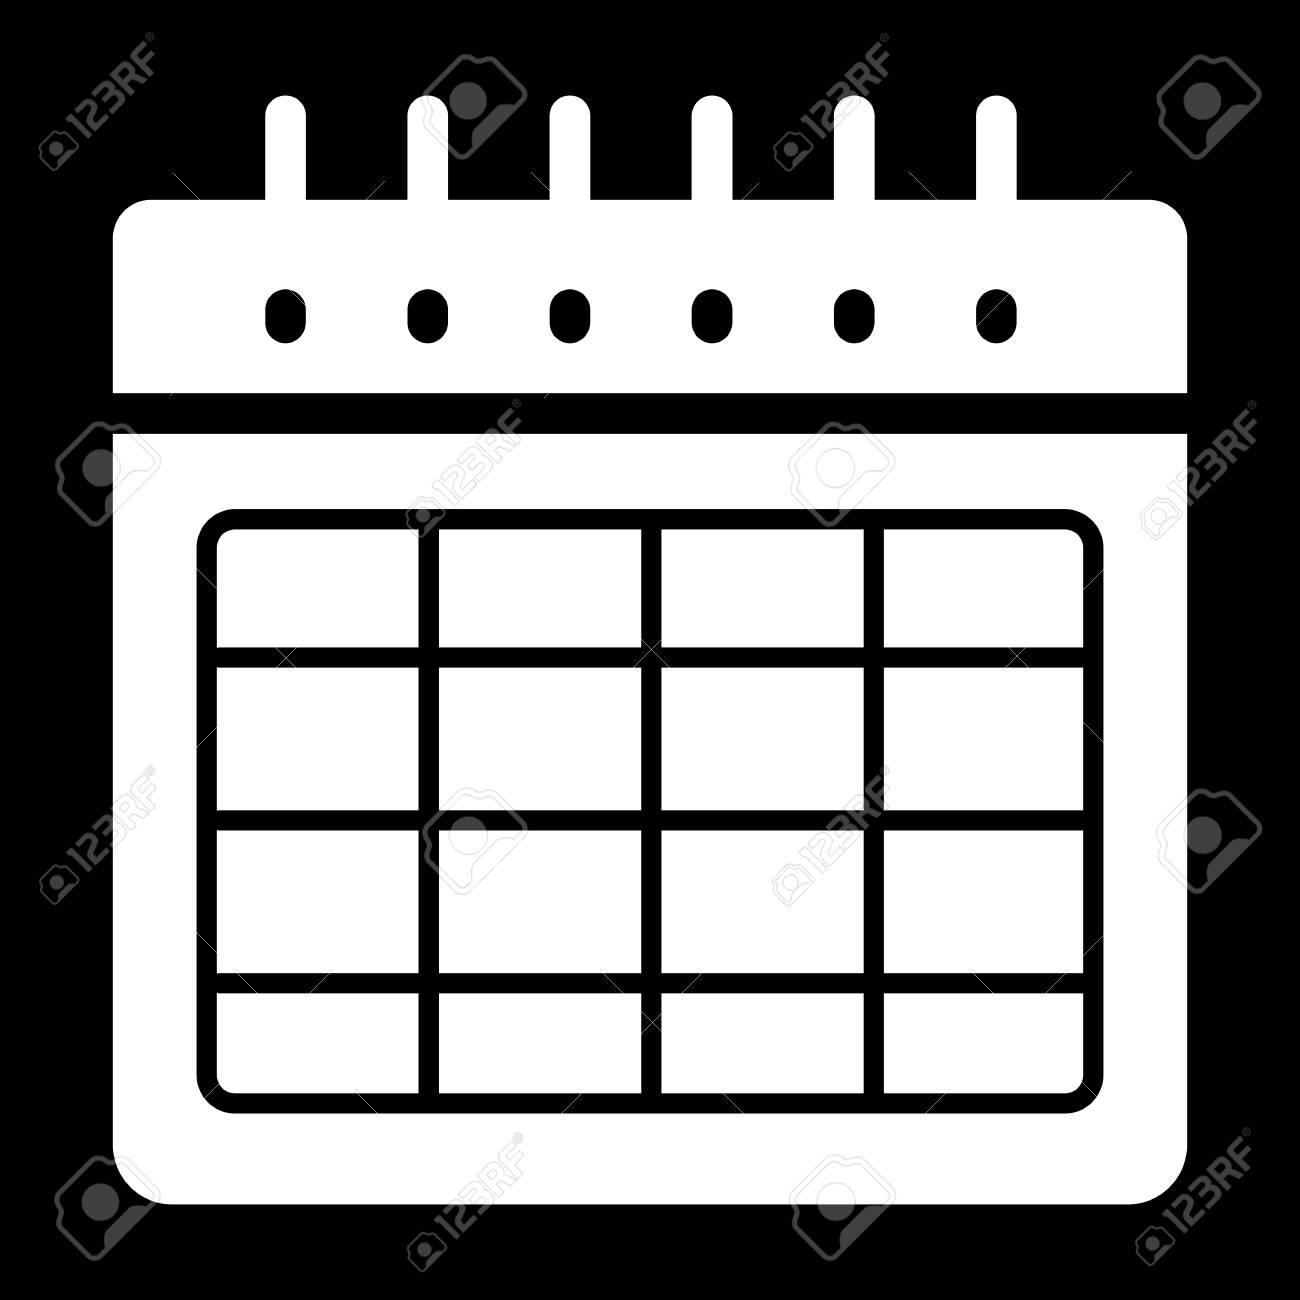 Calendario Vector Blanco.Timetable Blank Vector Icon Black And White Illustration Of